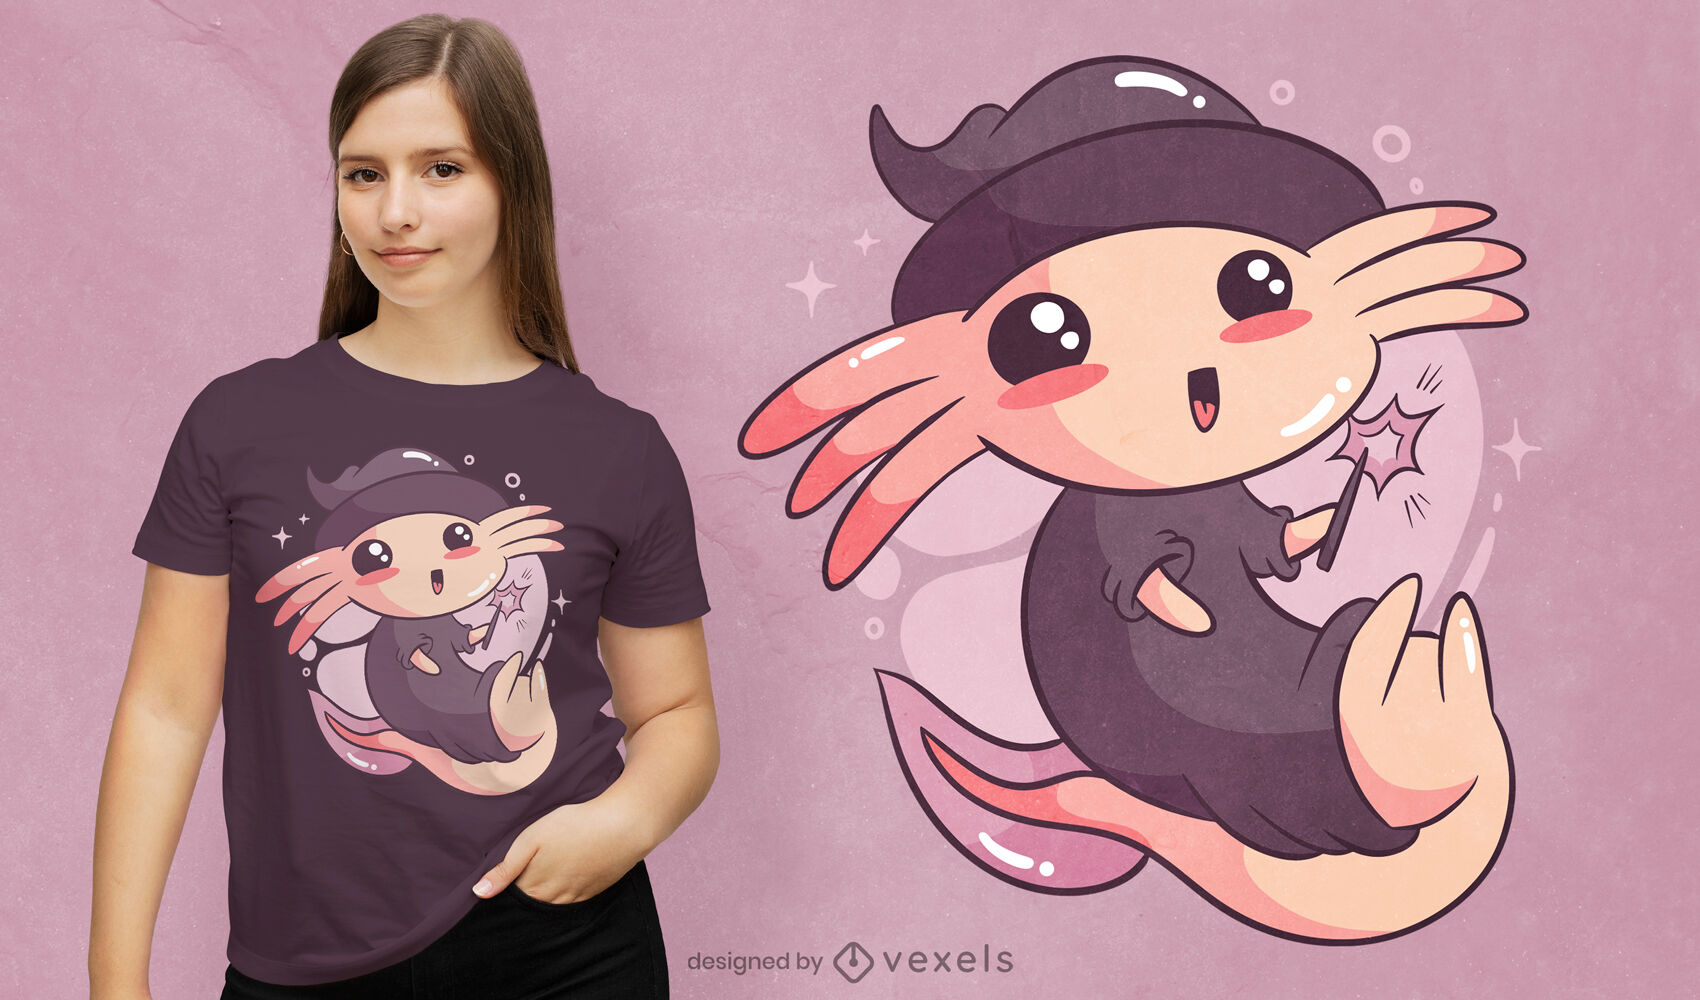 Cute halloween axolotl t-shirt design